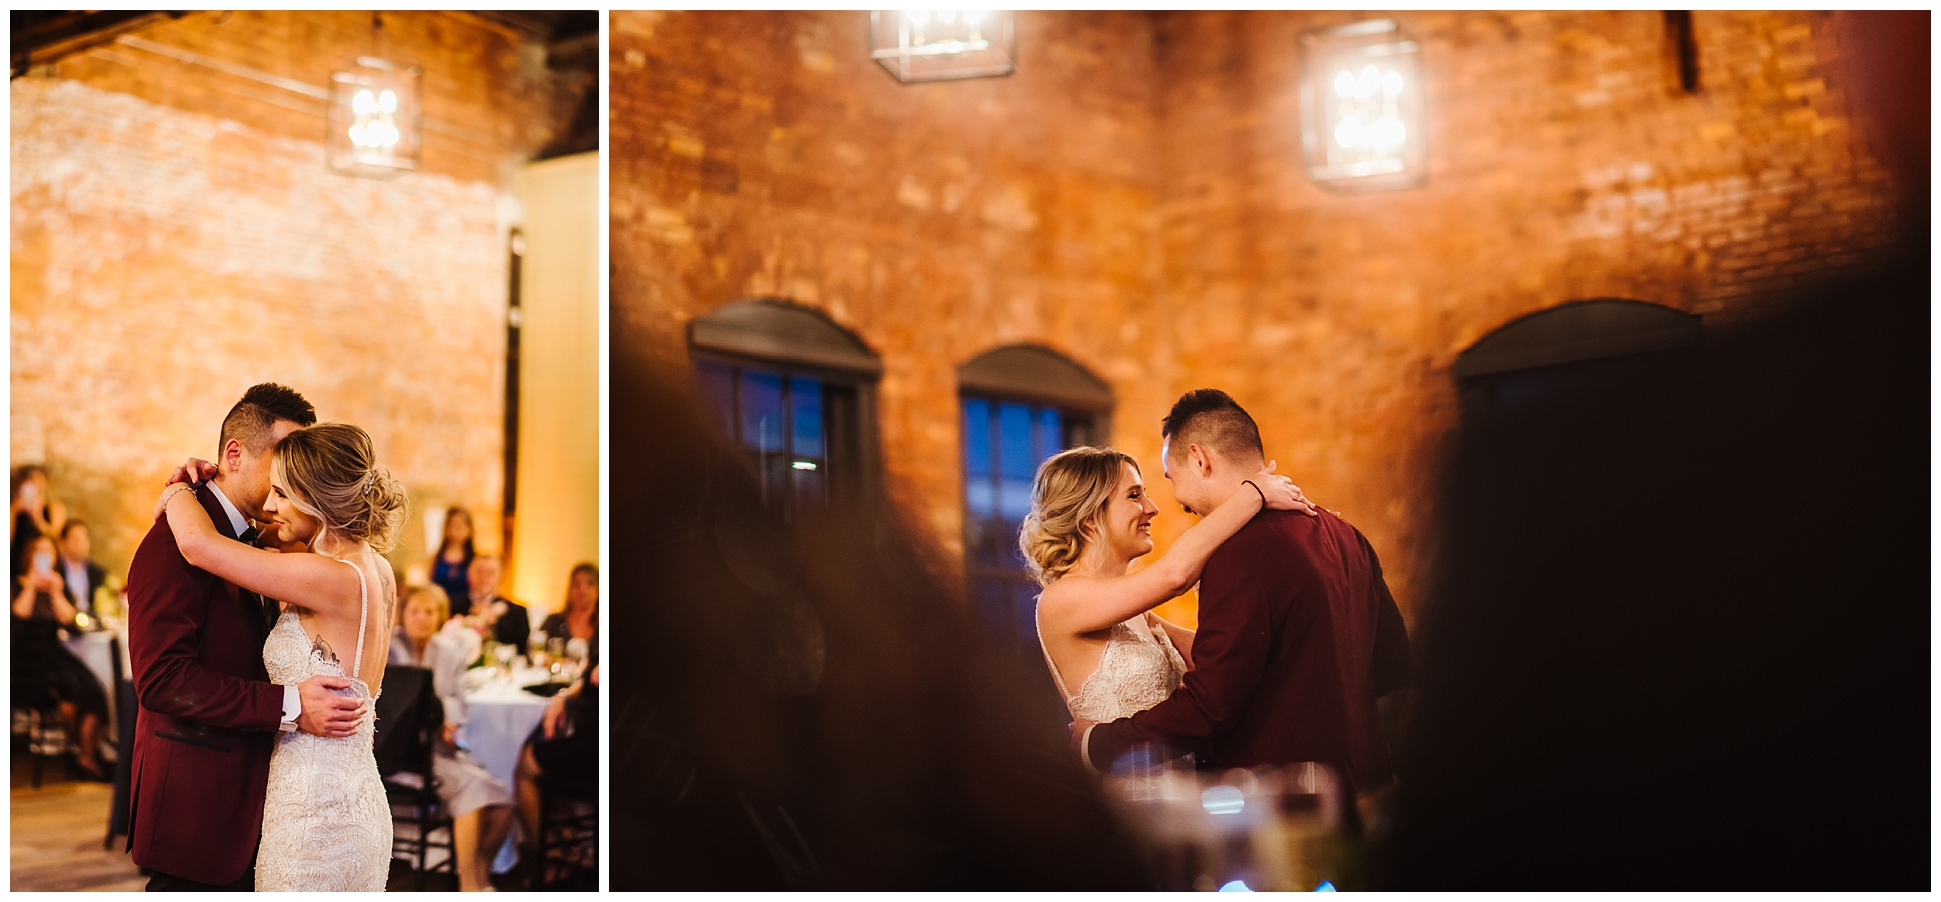 tampa-armeture-wedding-photographer-edgy-industrial-downtown-fancy-free-nursery-tattoo-burgandy-velvet_0069.jpg